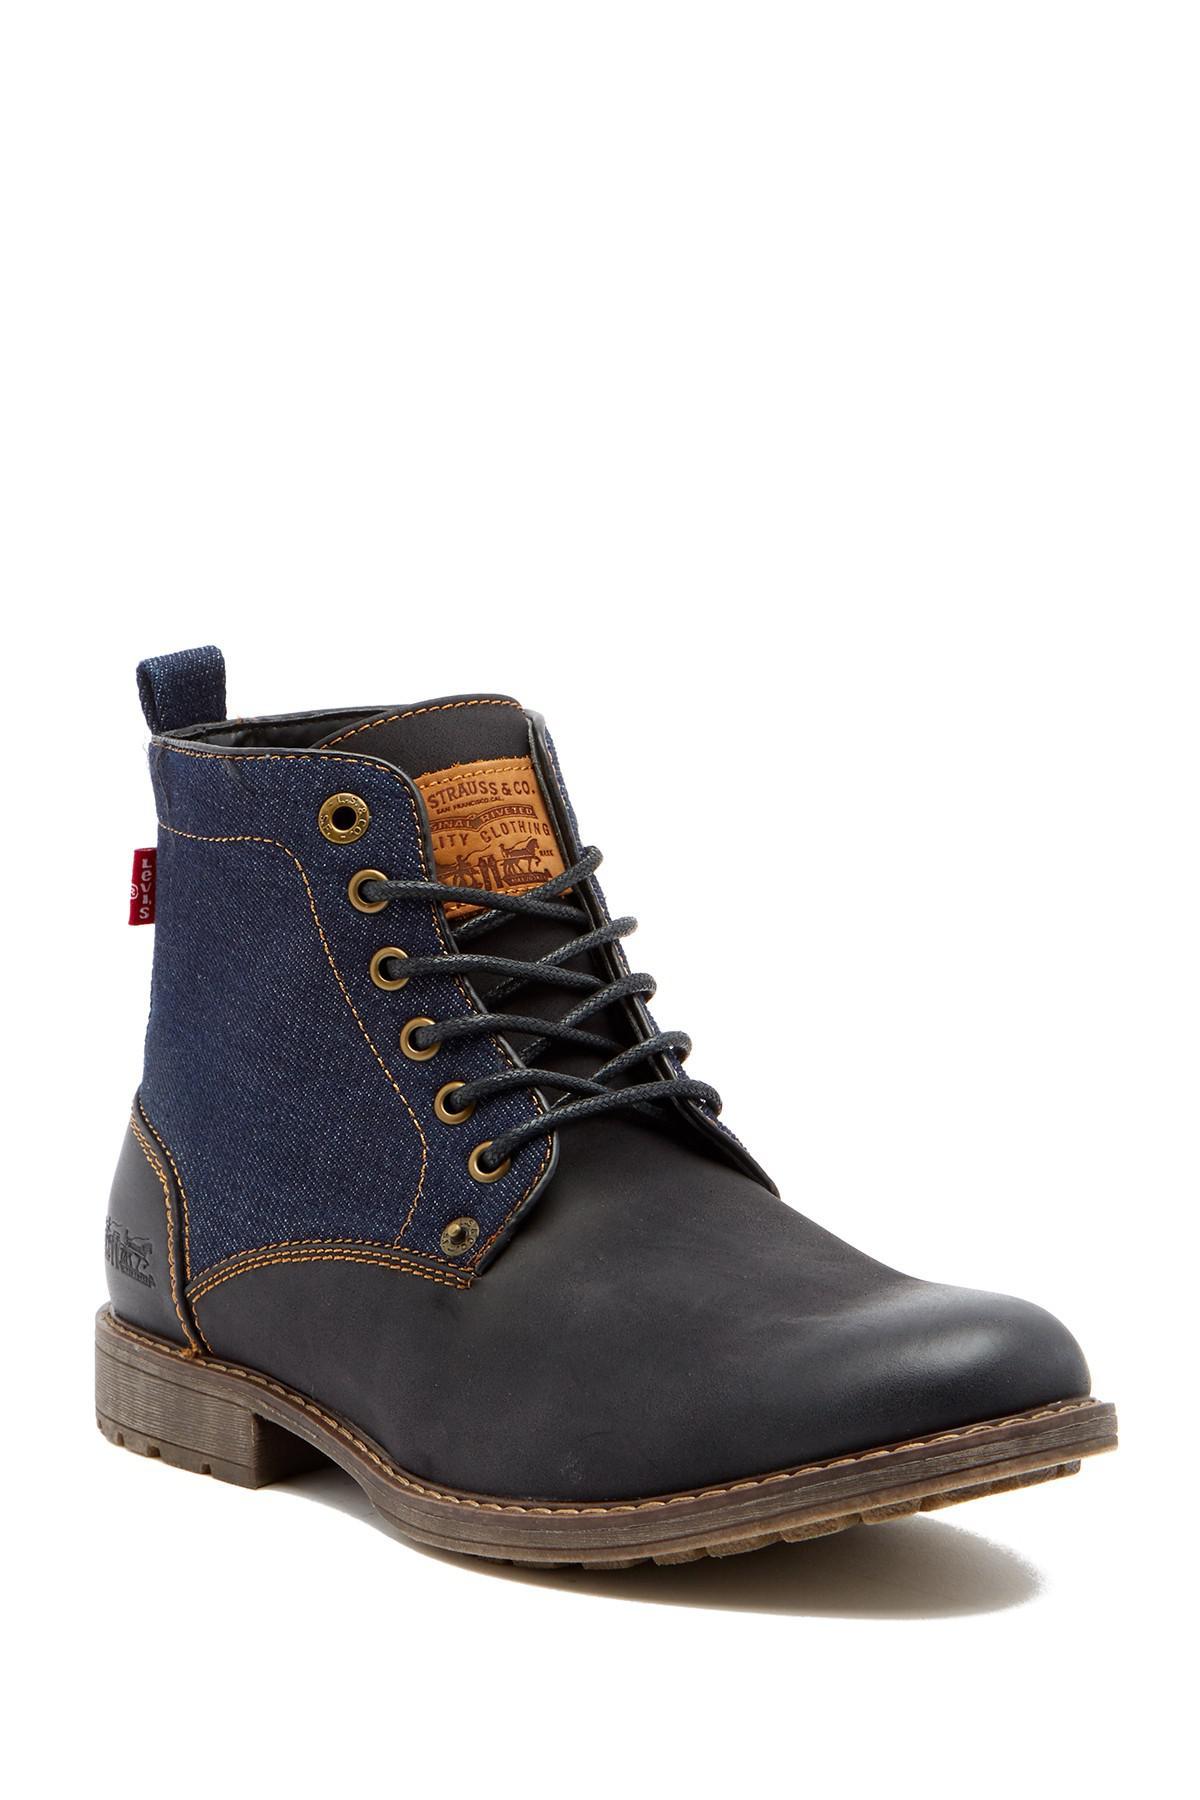 Levi S Shoes Canada